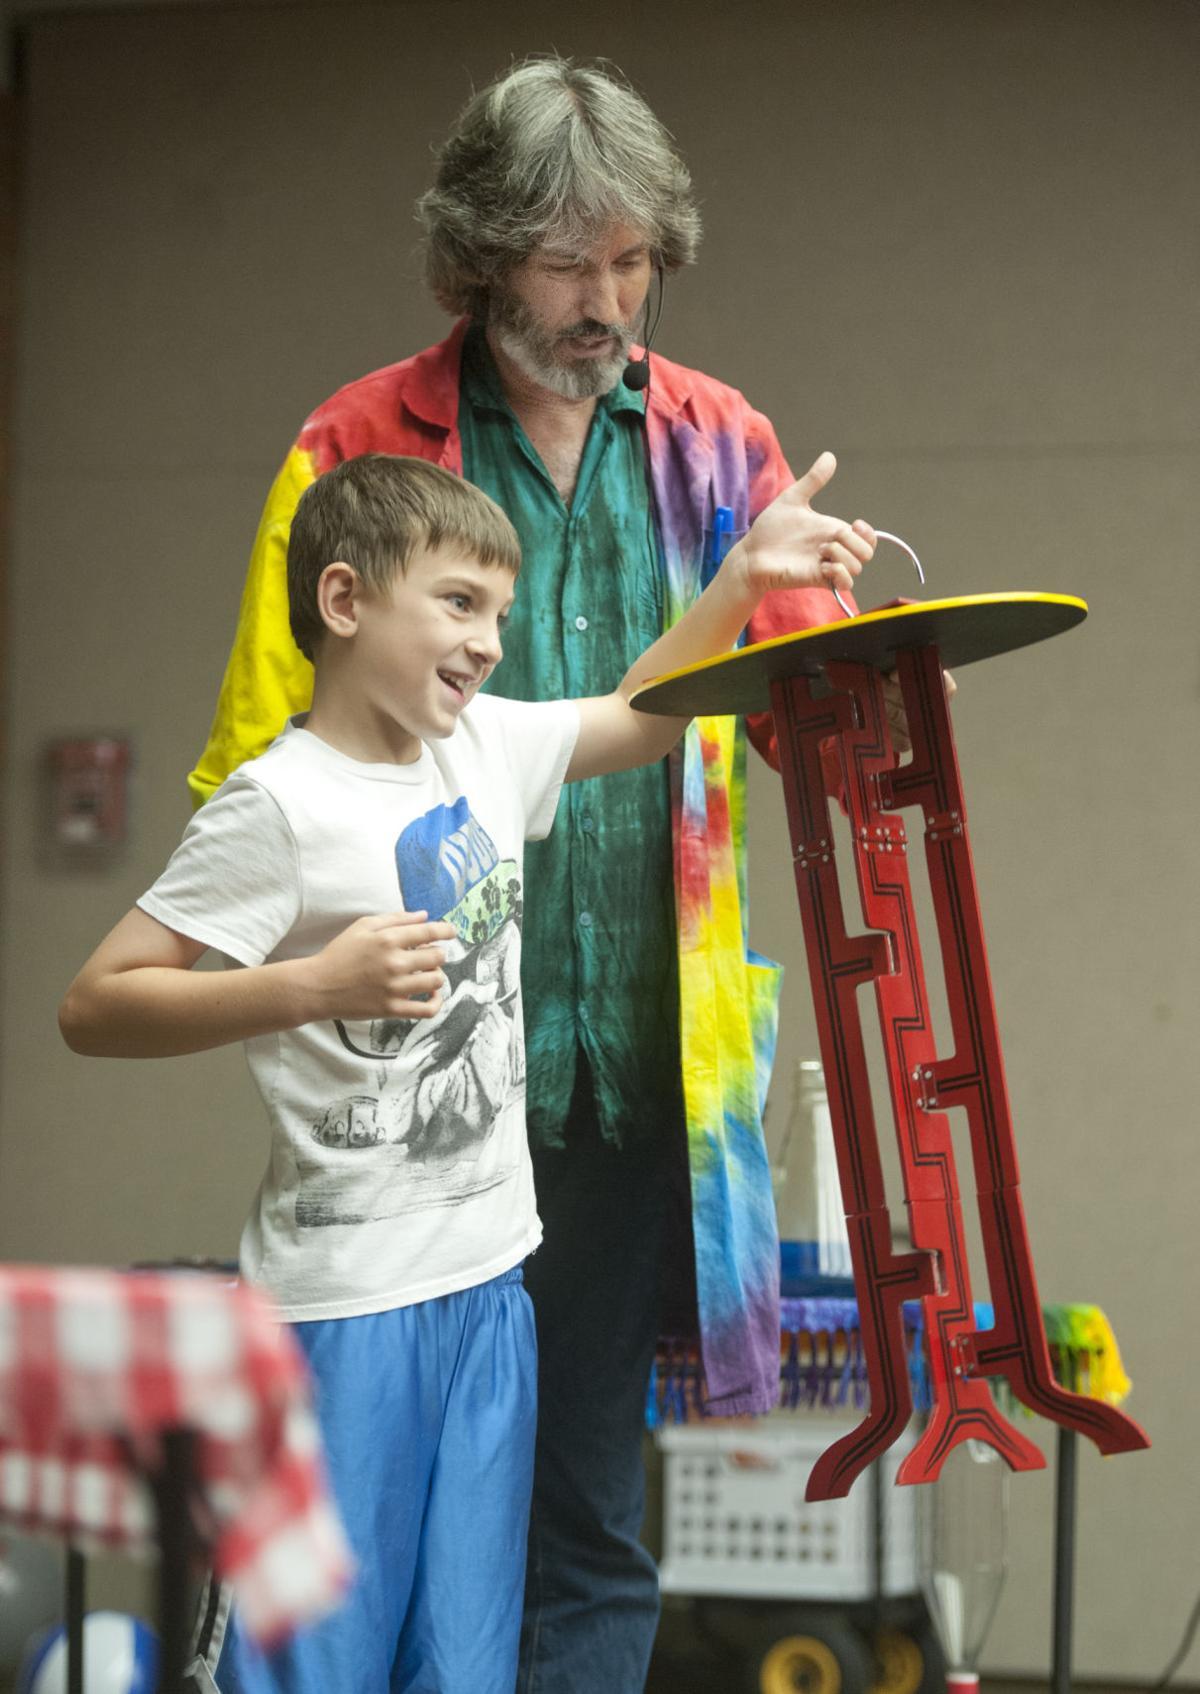 STEM-ulating act captivates Lodi kids